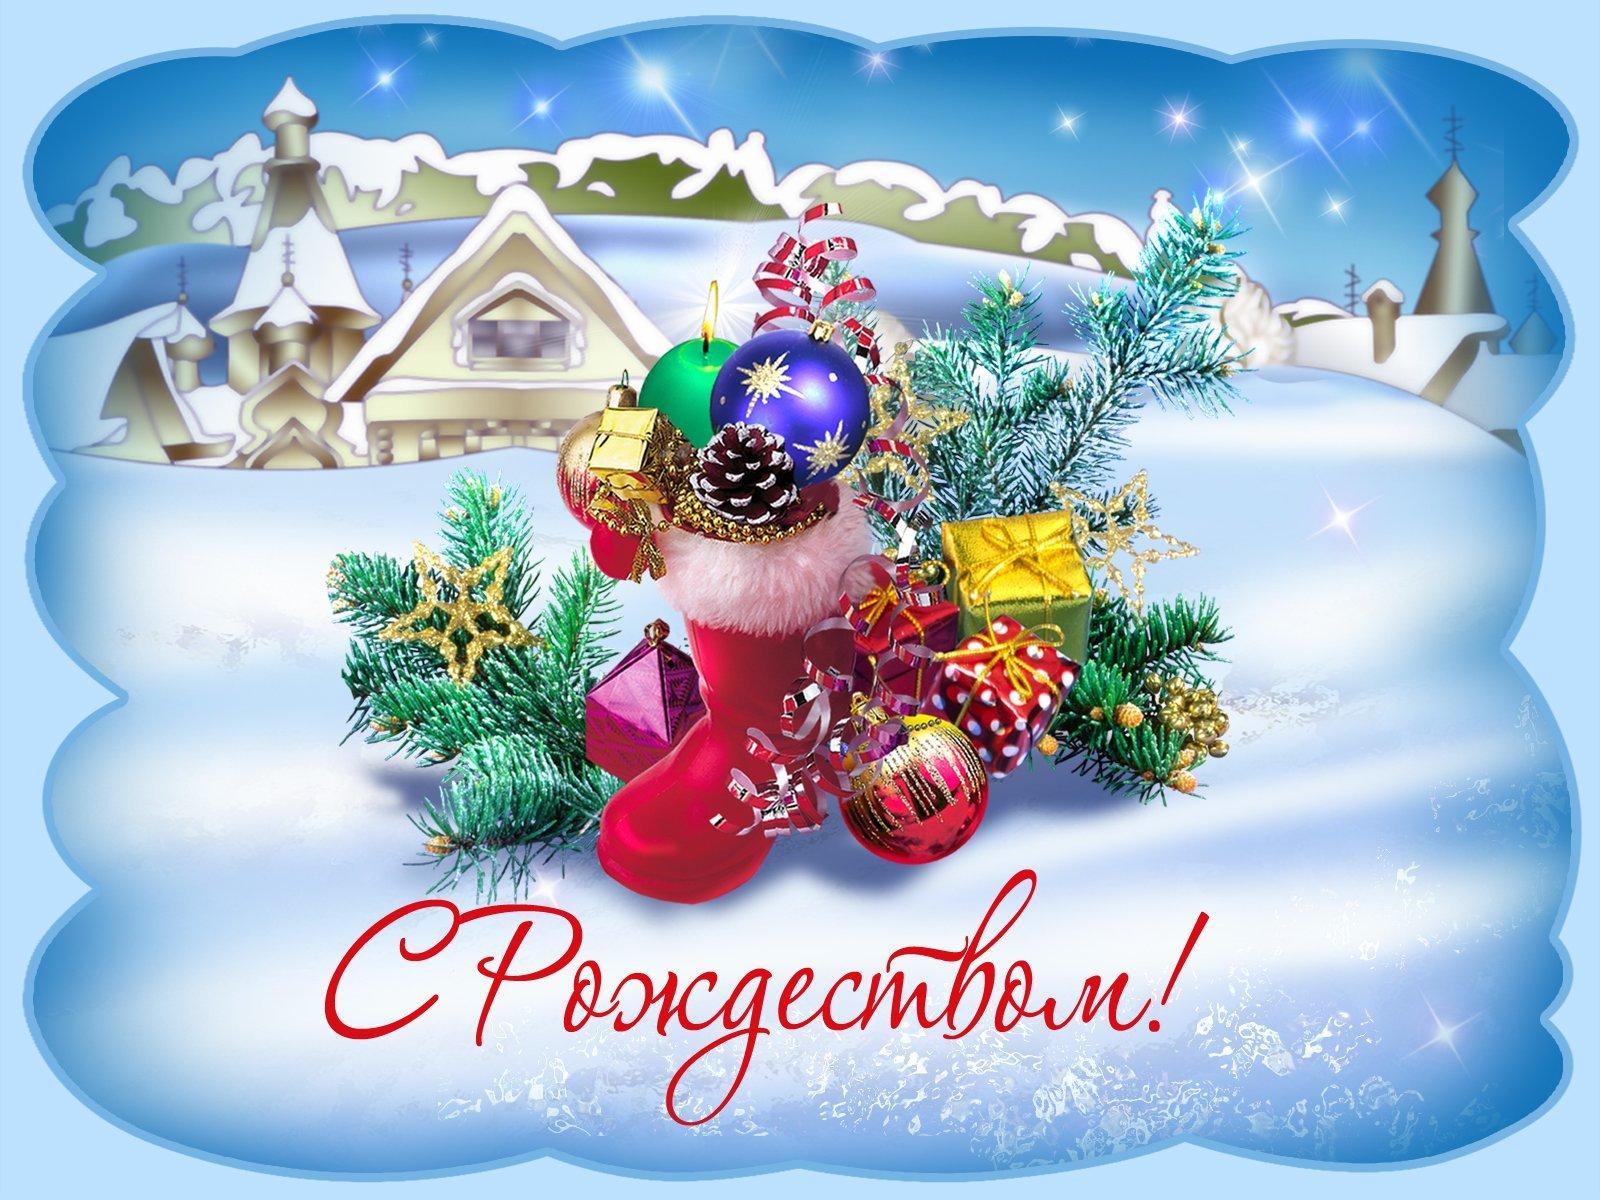 Вам, открытки на рождество 2015